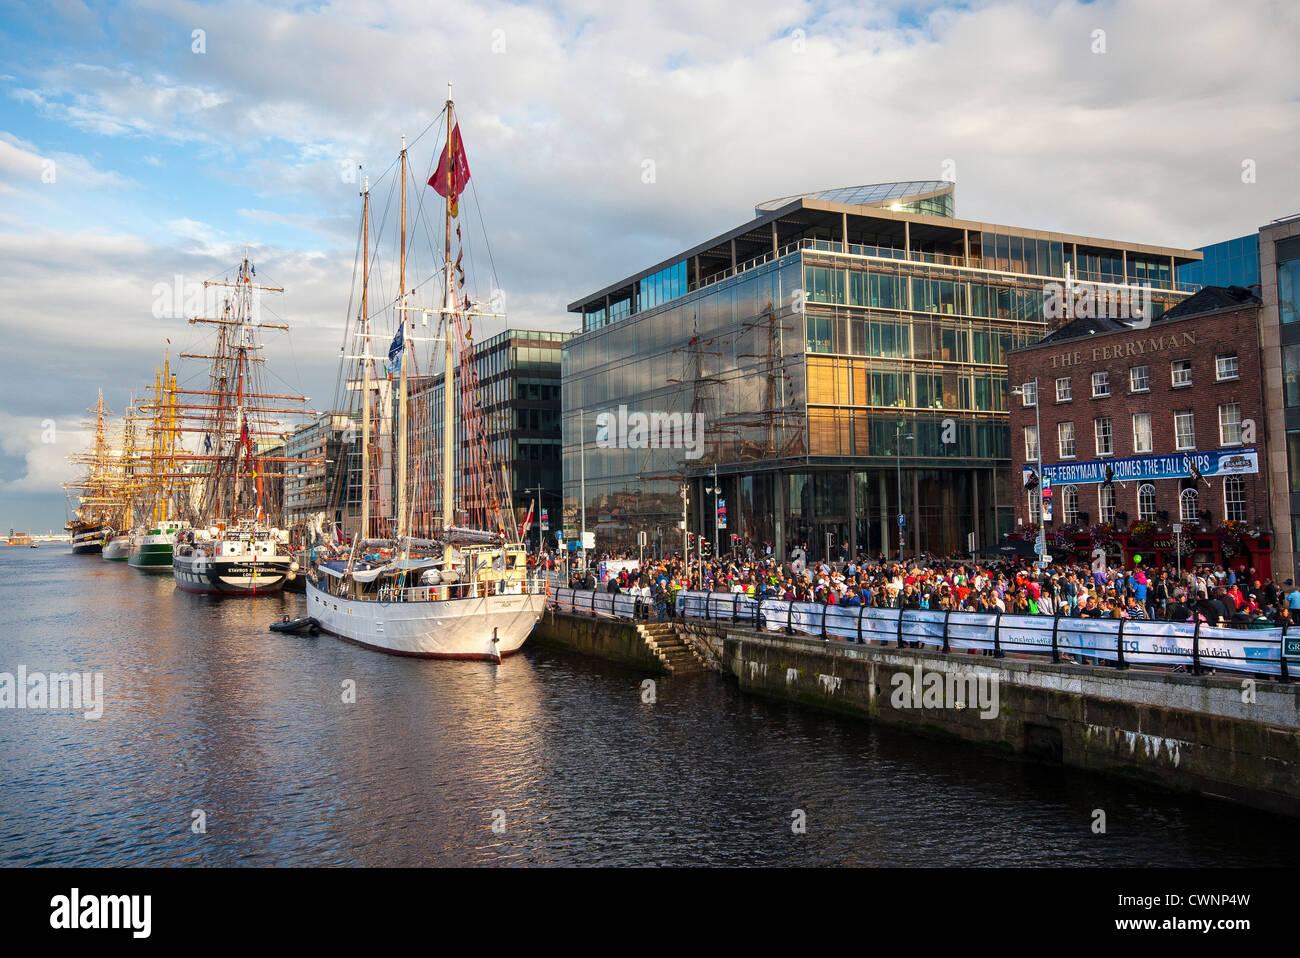 The Tall Ships Races Festival on Sir John Rogerson's Quay in Dublin - Stock Image